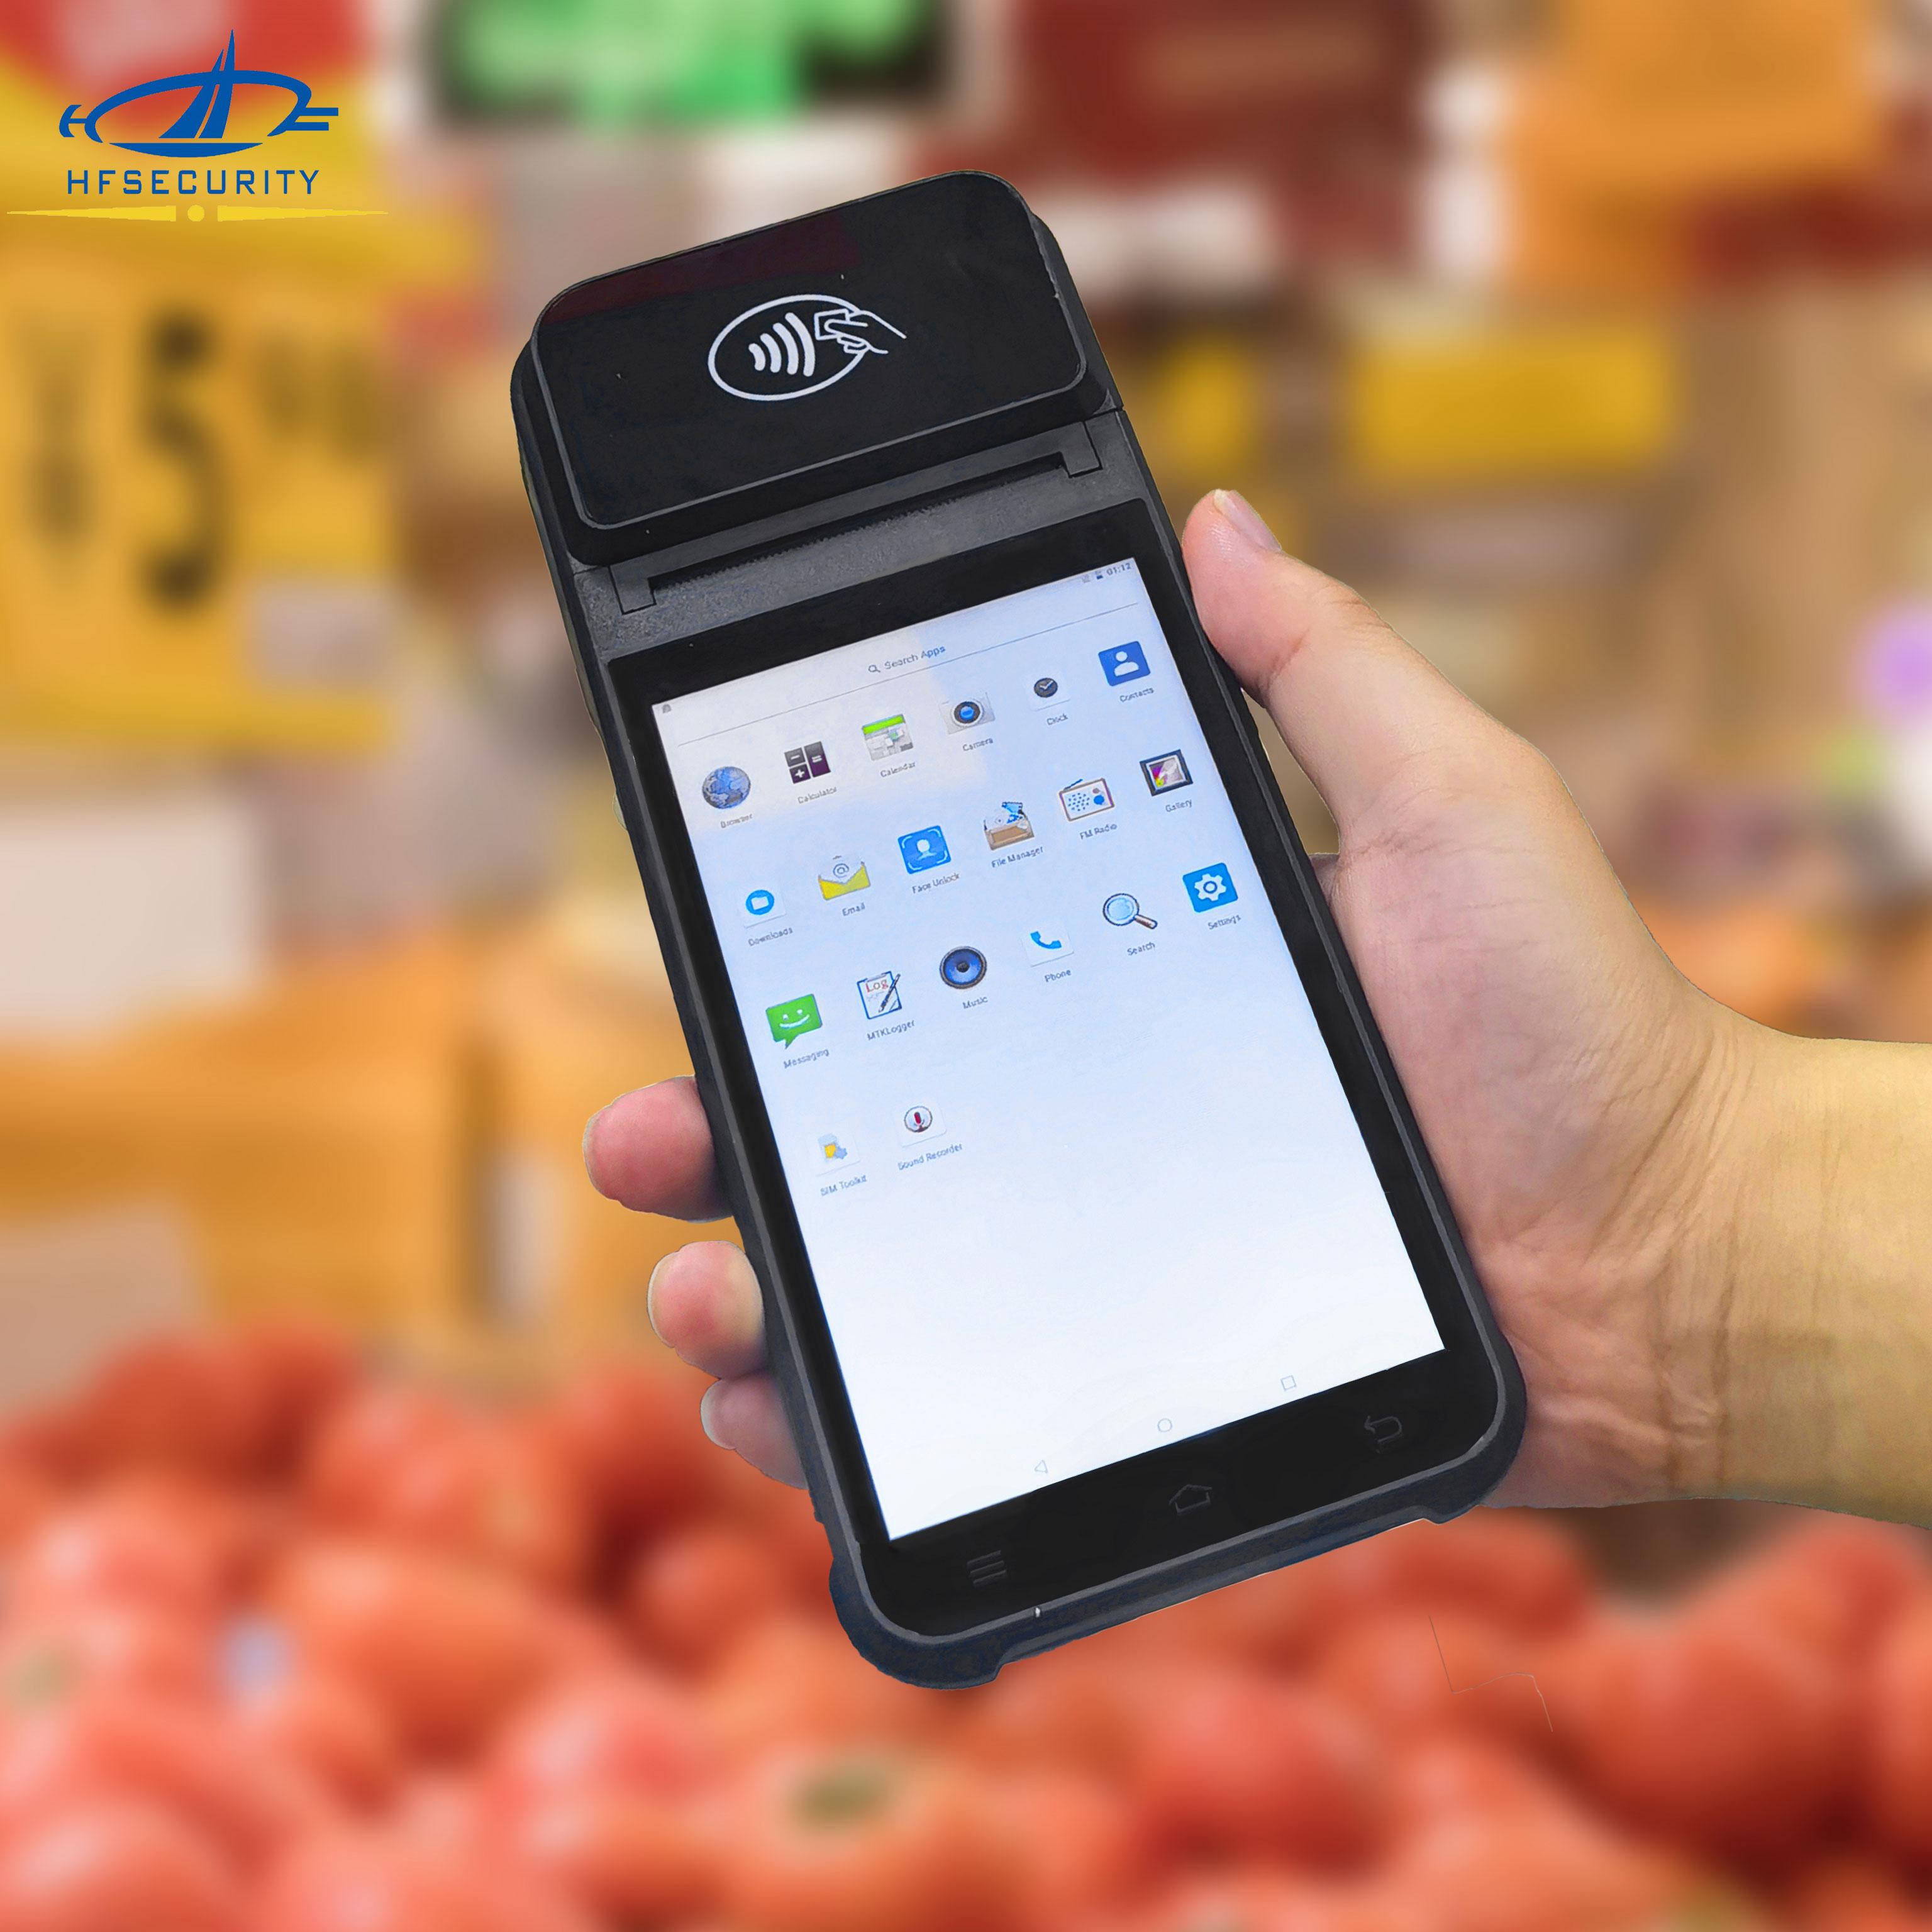 biometric pos terminals market